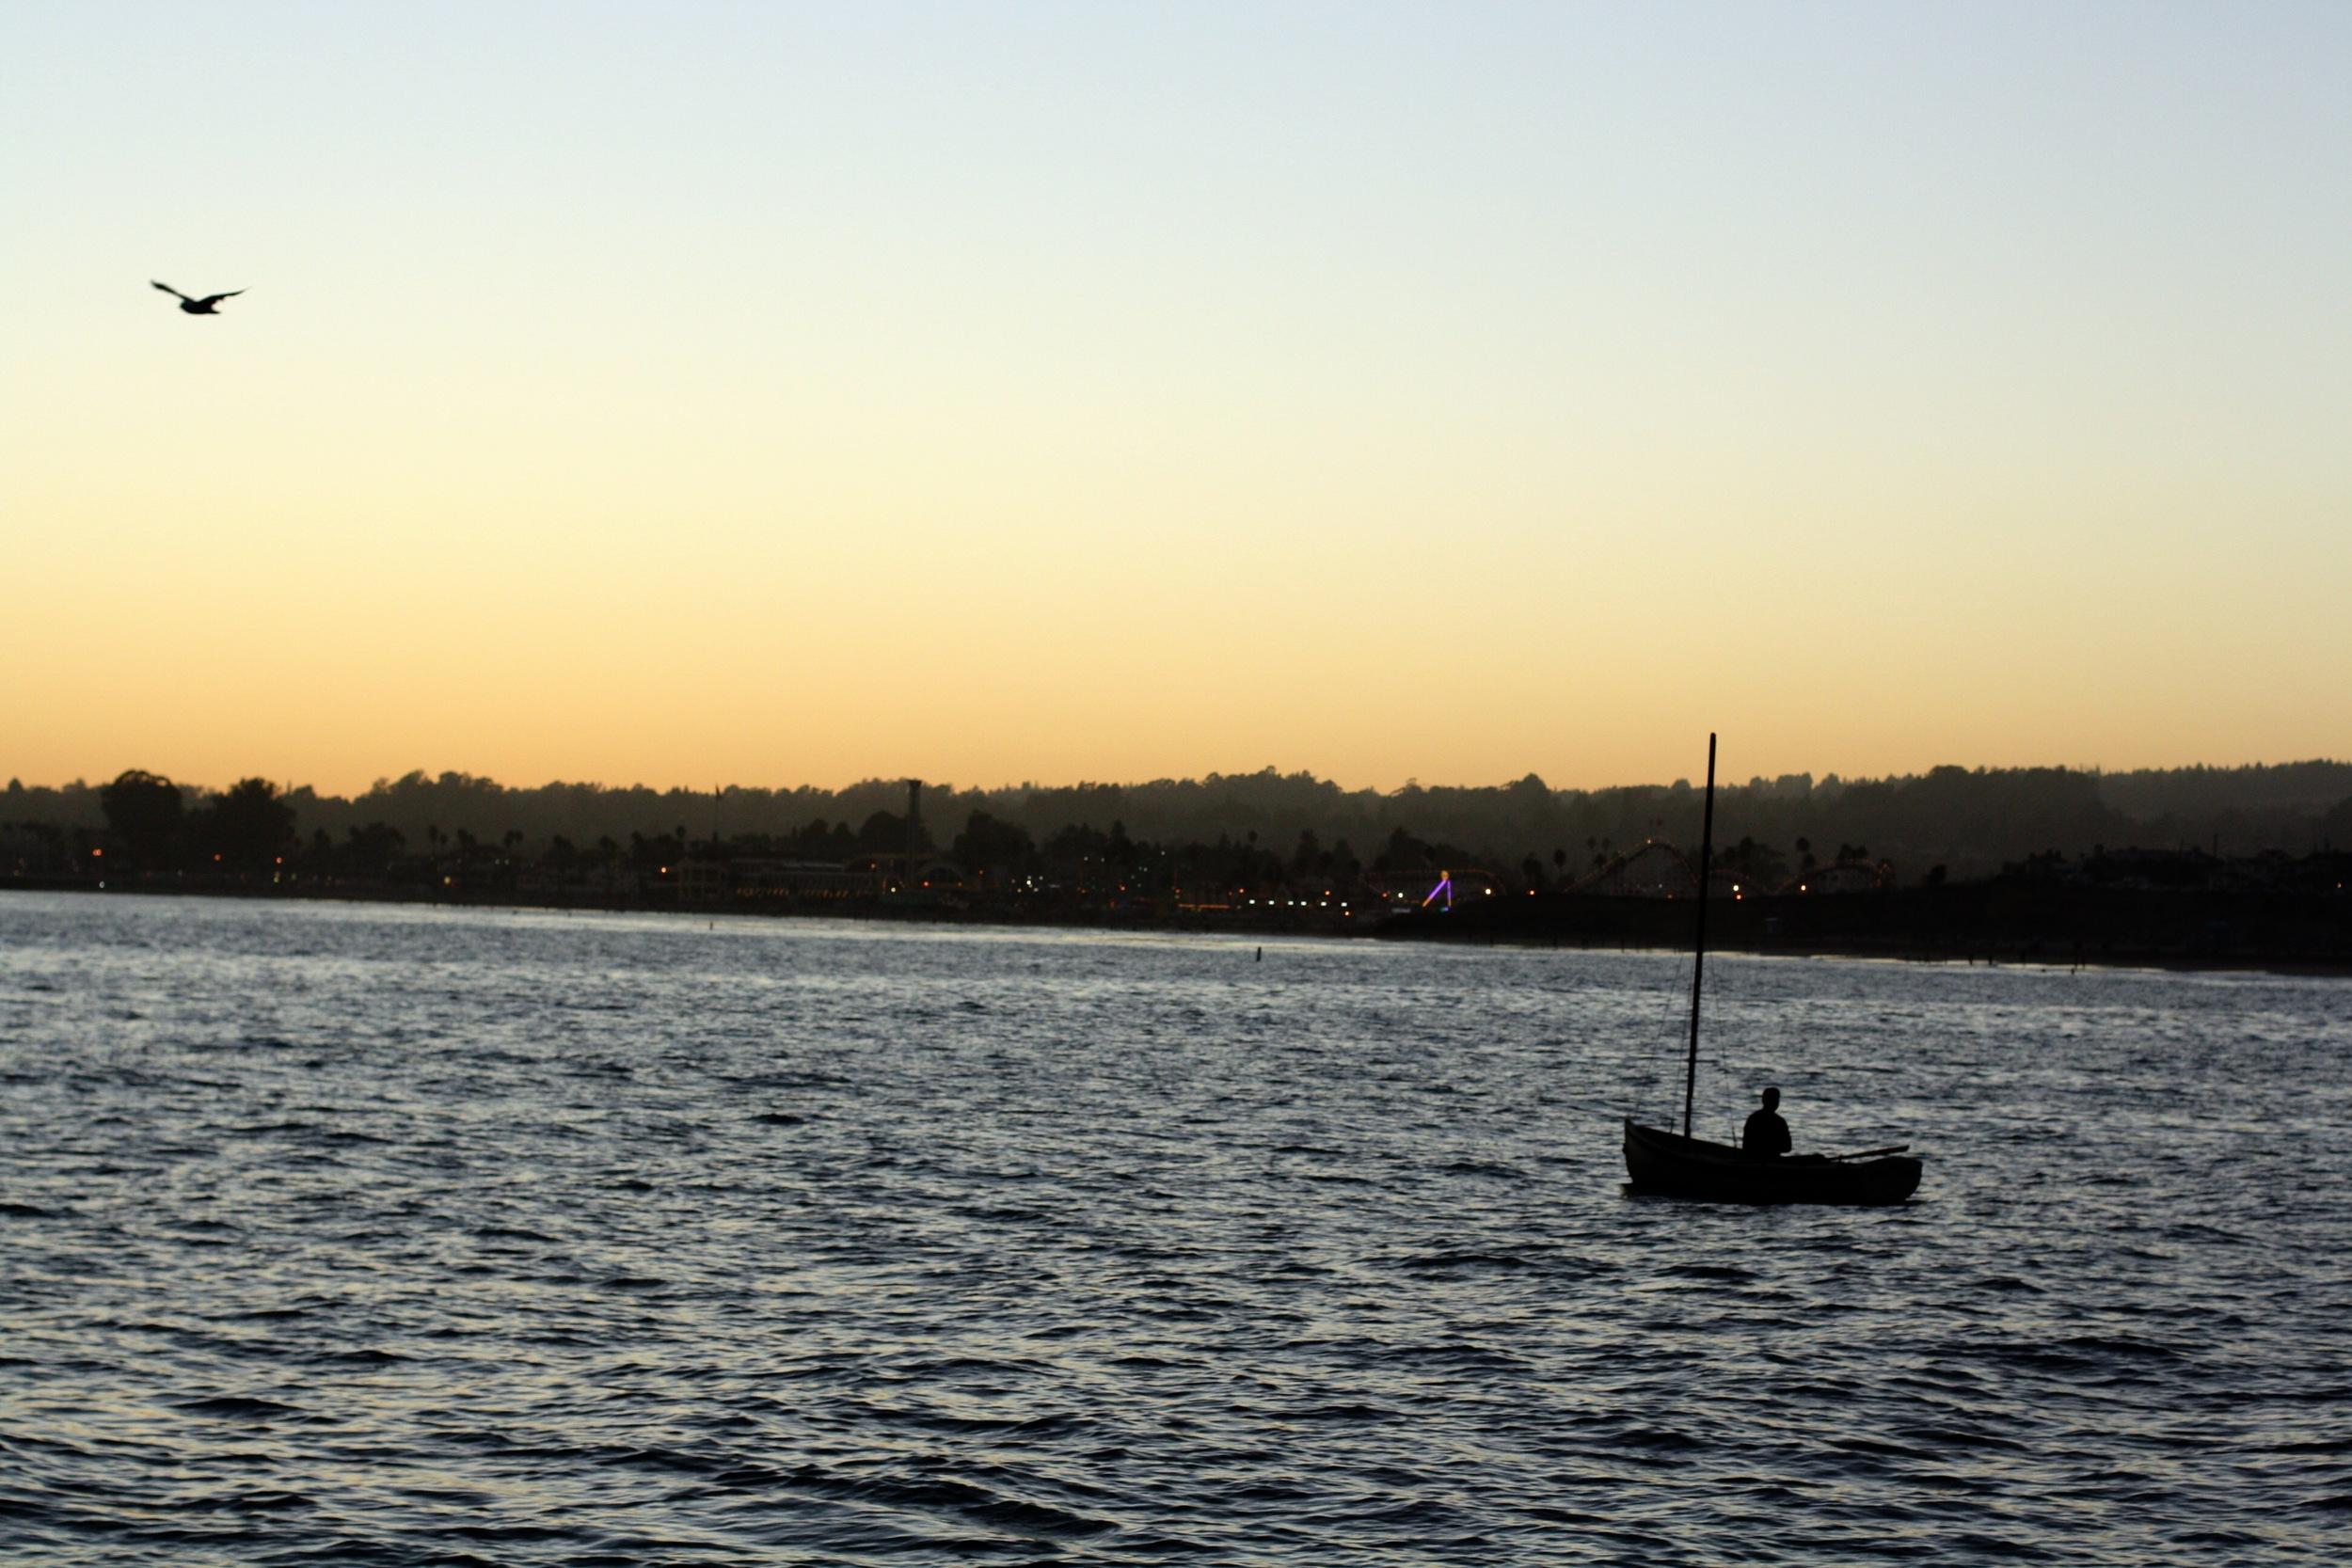 Chardonnay-Sail_lonely-boat_heatherbyhand.jpg